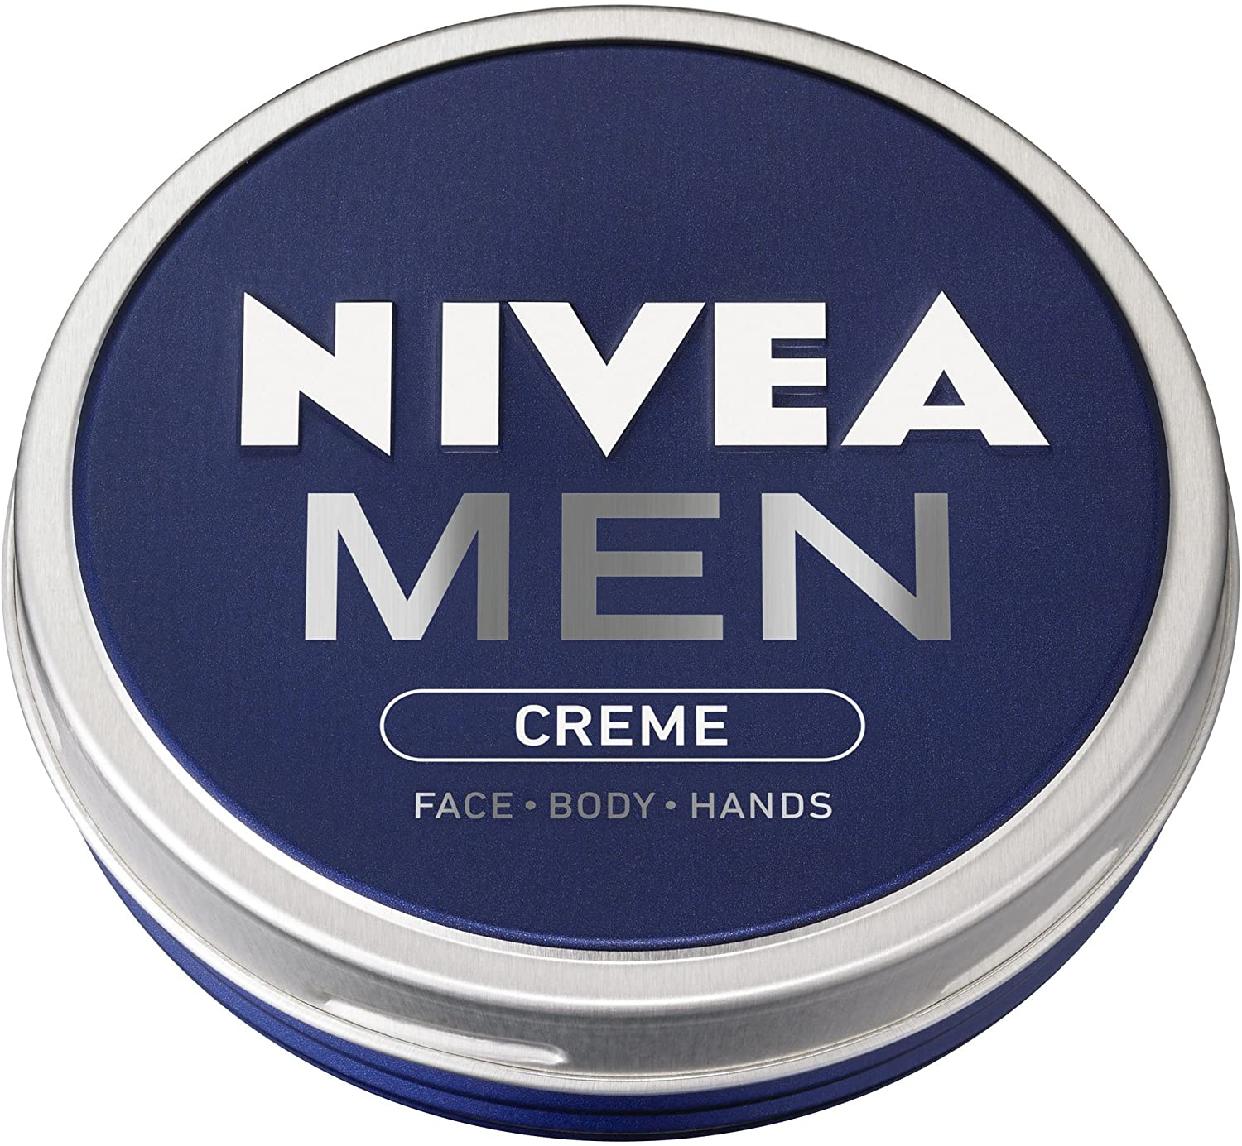 NIVEA MEN(ニベアメン)クリームの商品画像